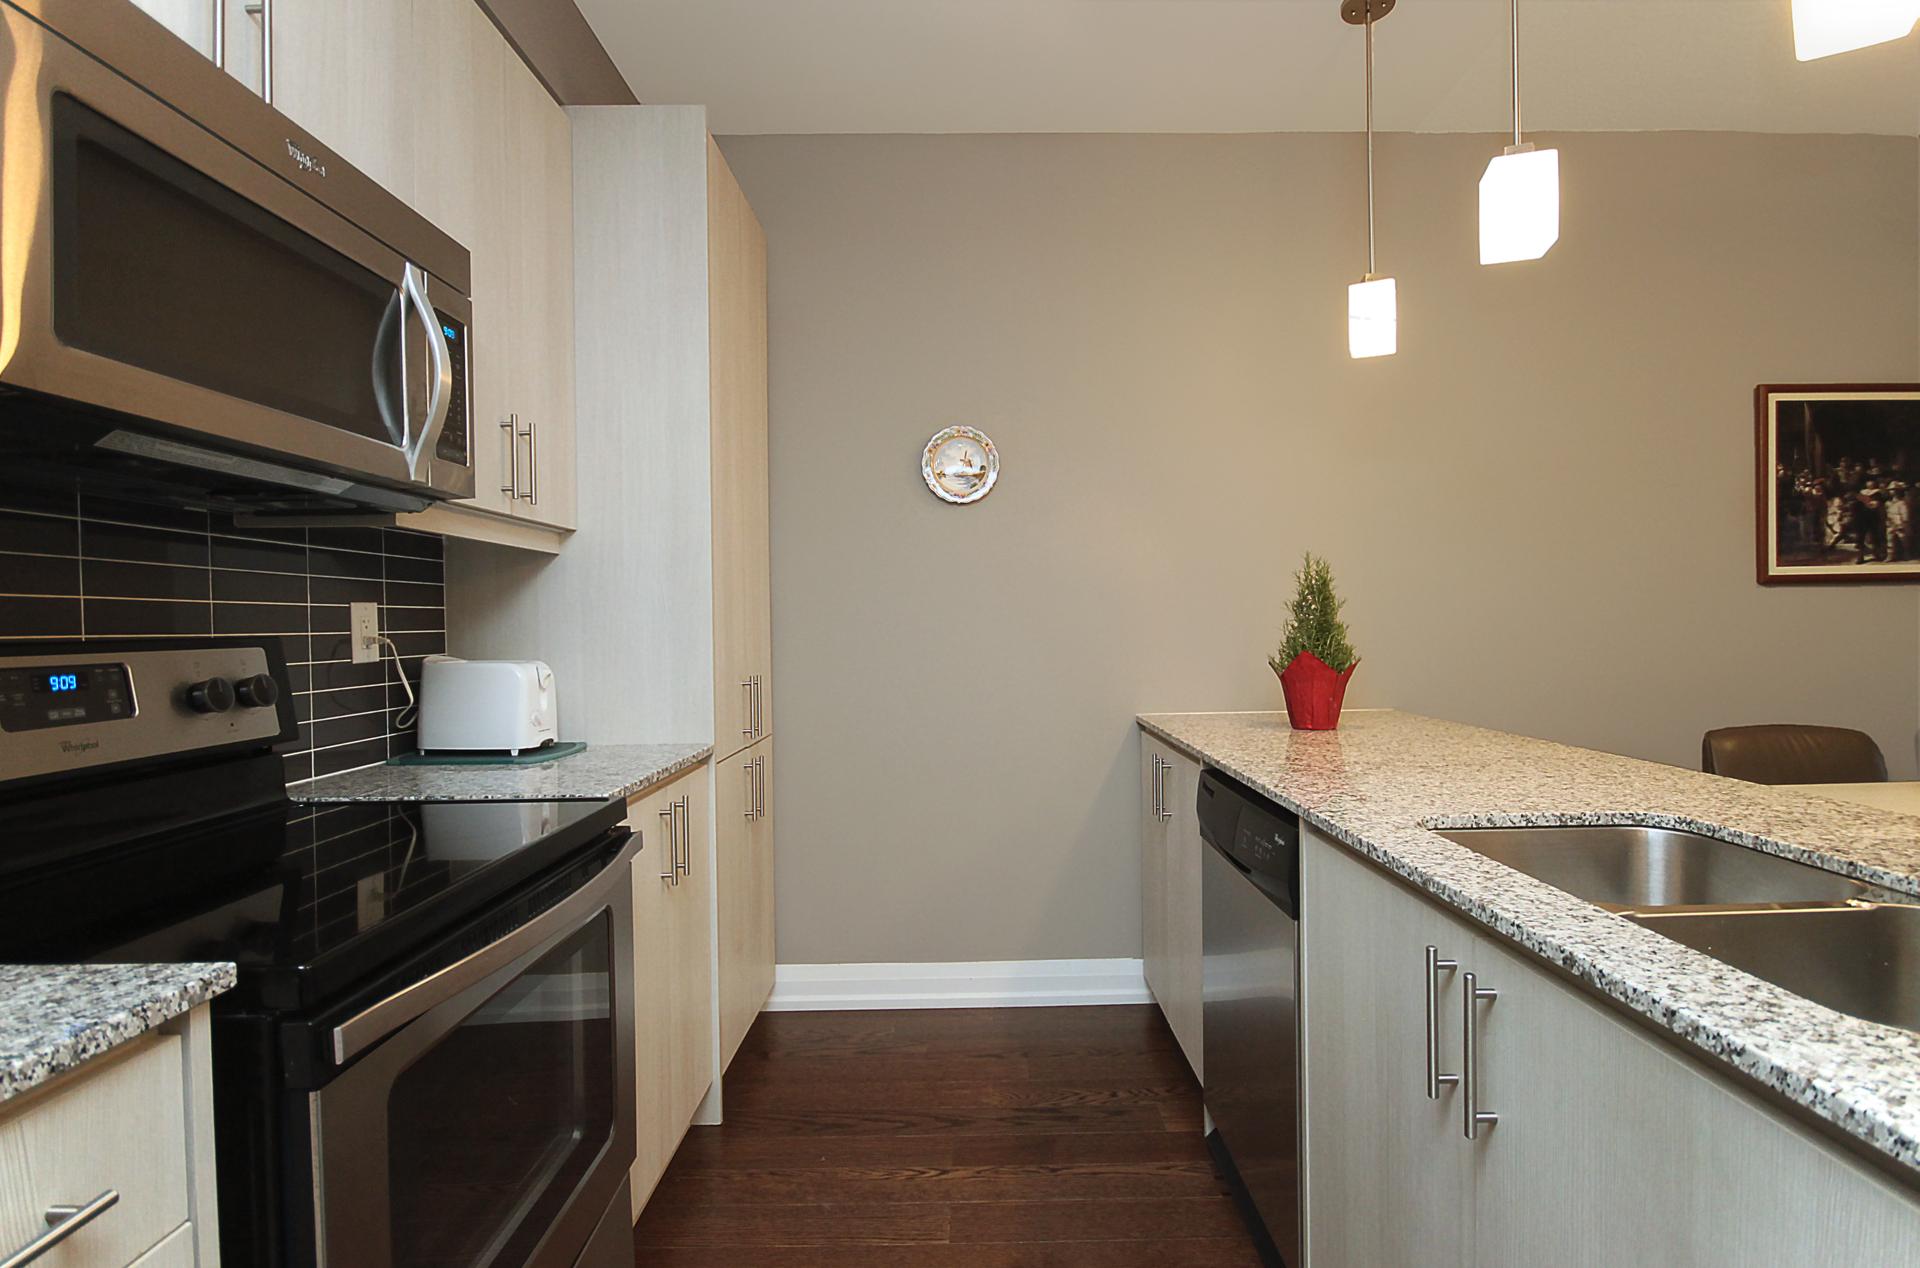 Kitchen at 708 - 85 The Donway Donway W, Banbury-Don Mills, Toronto